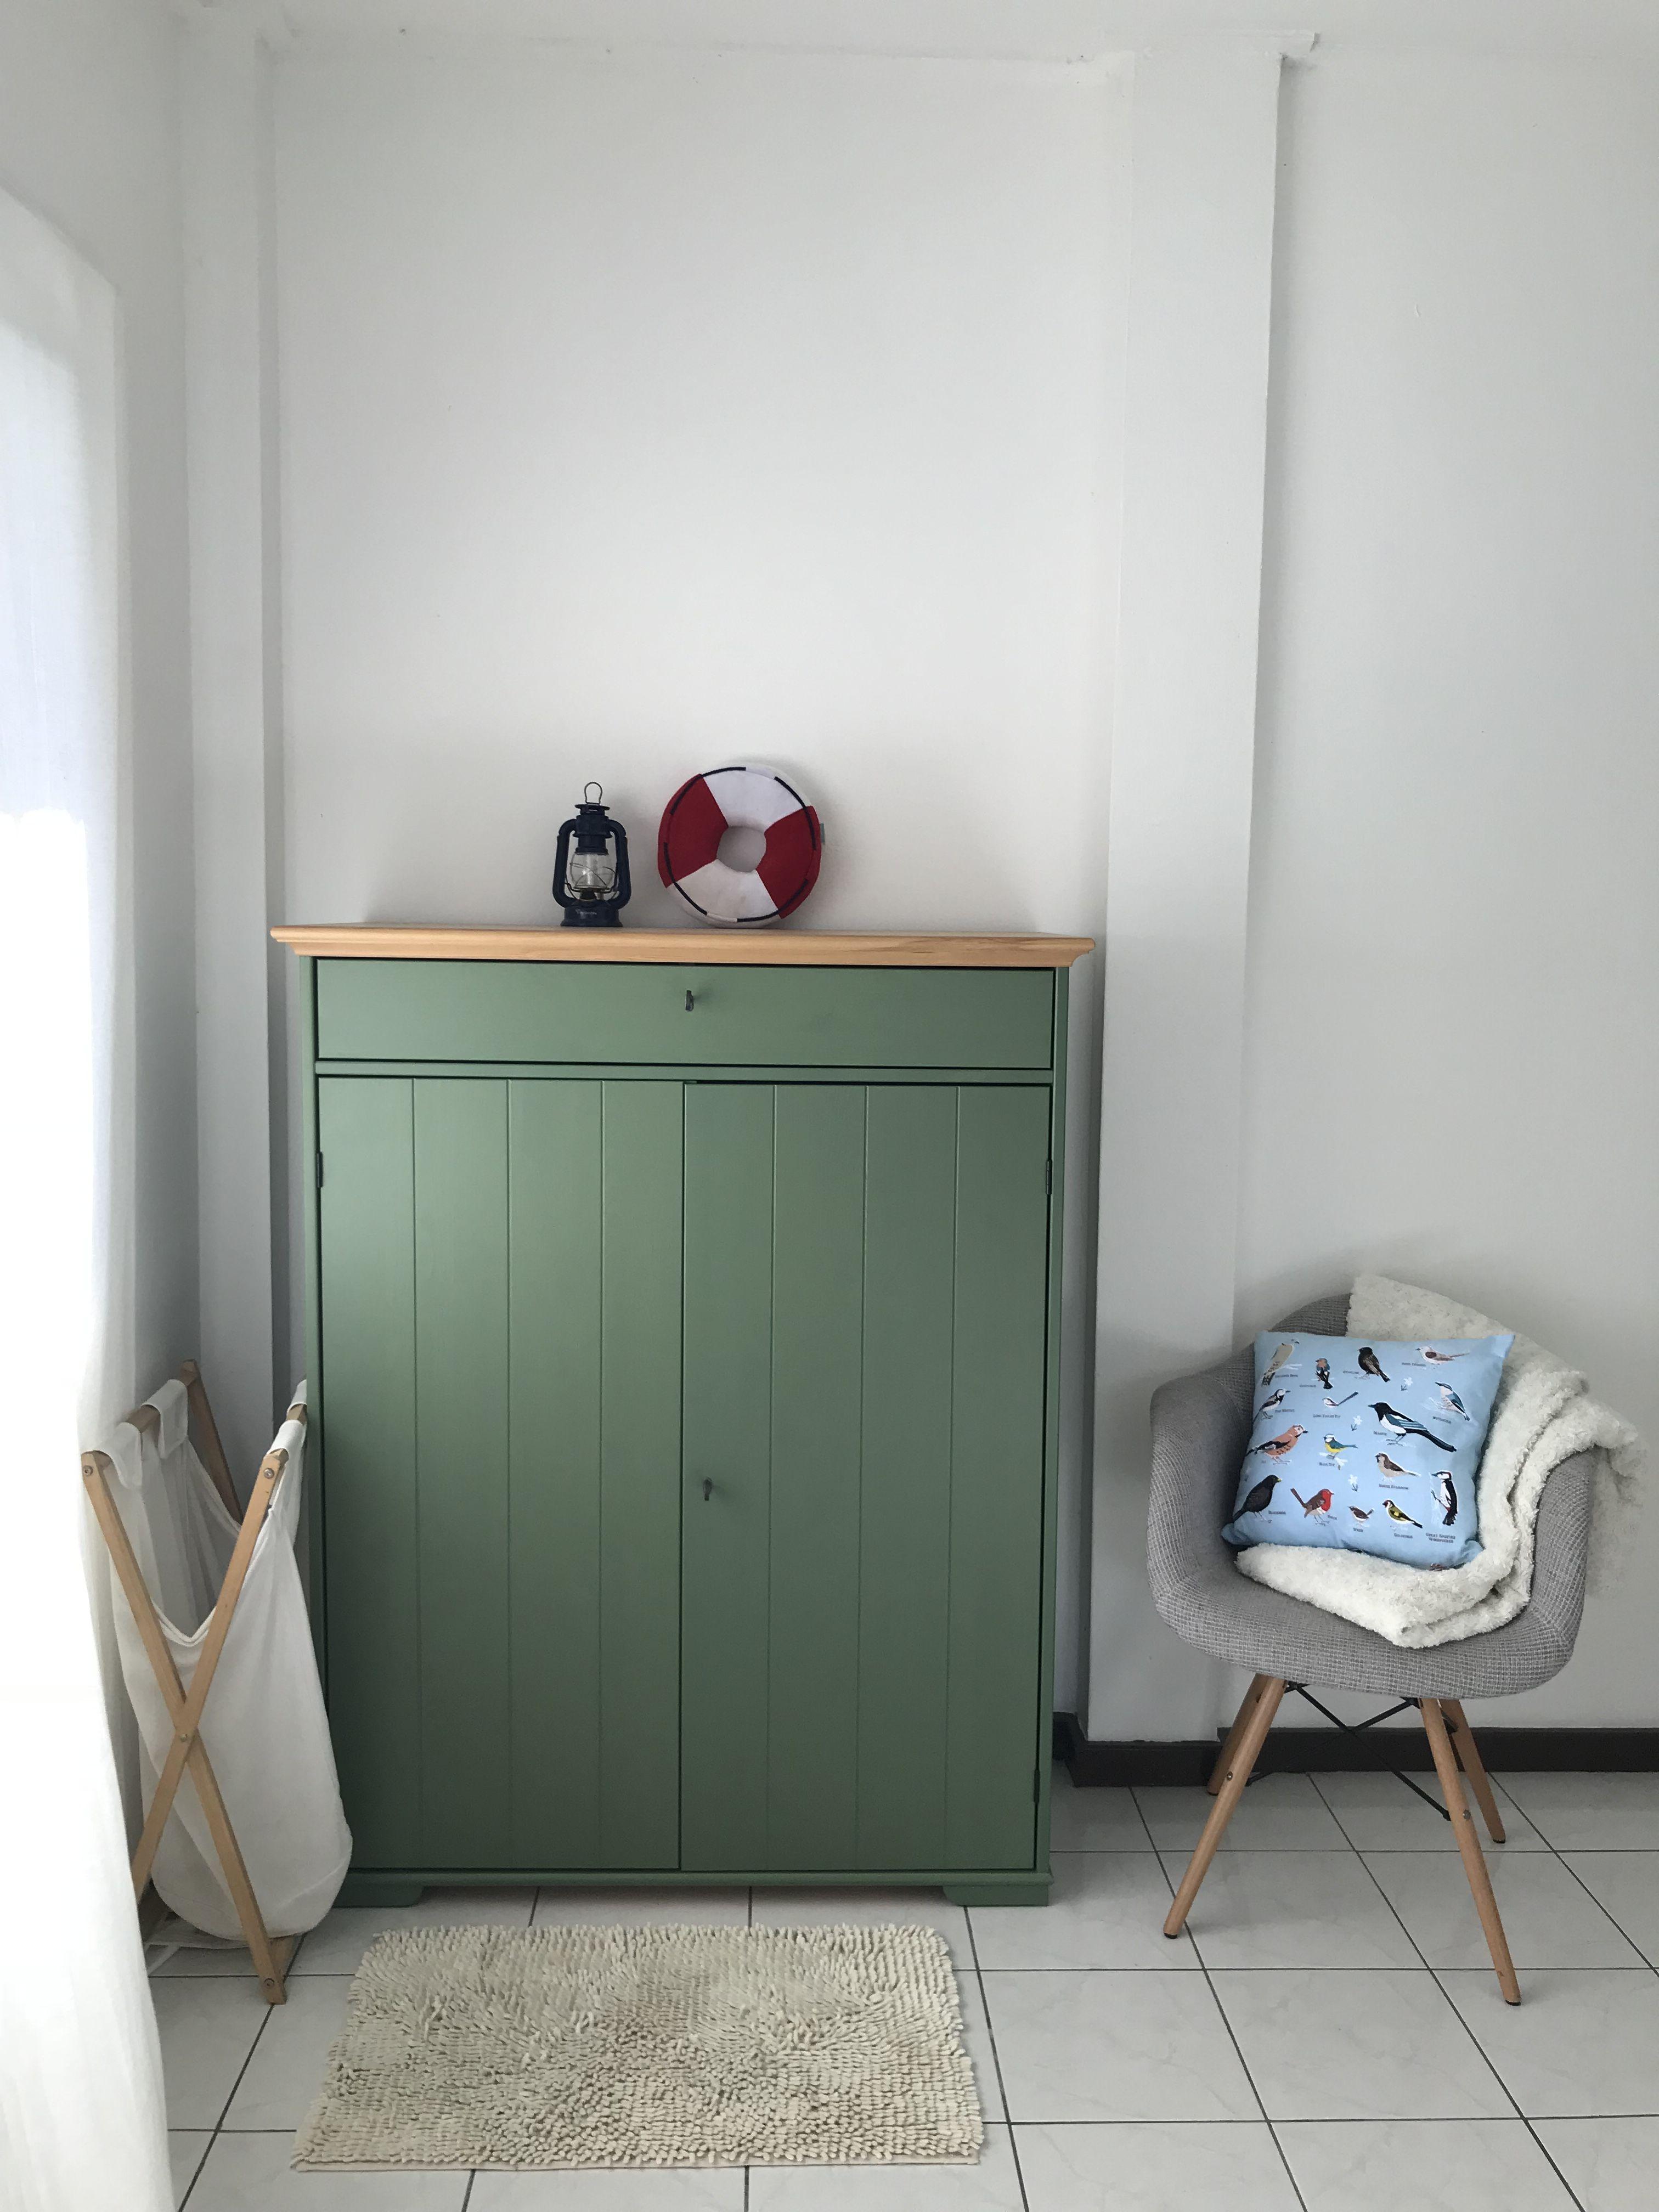 Hurdal ikea | Home decor, Decor, Furniture